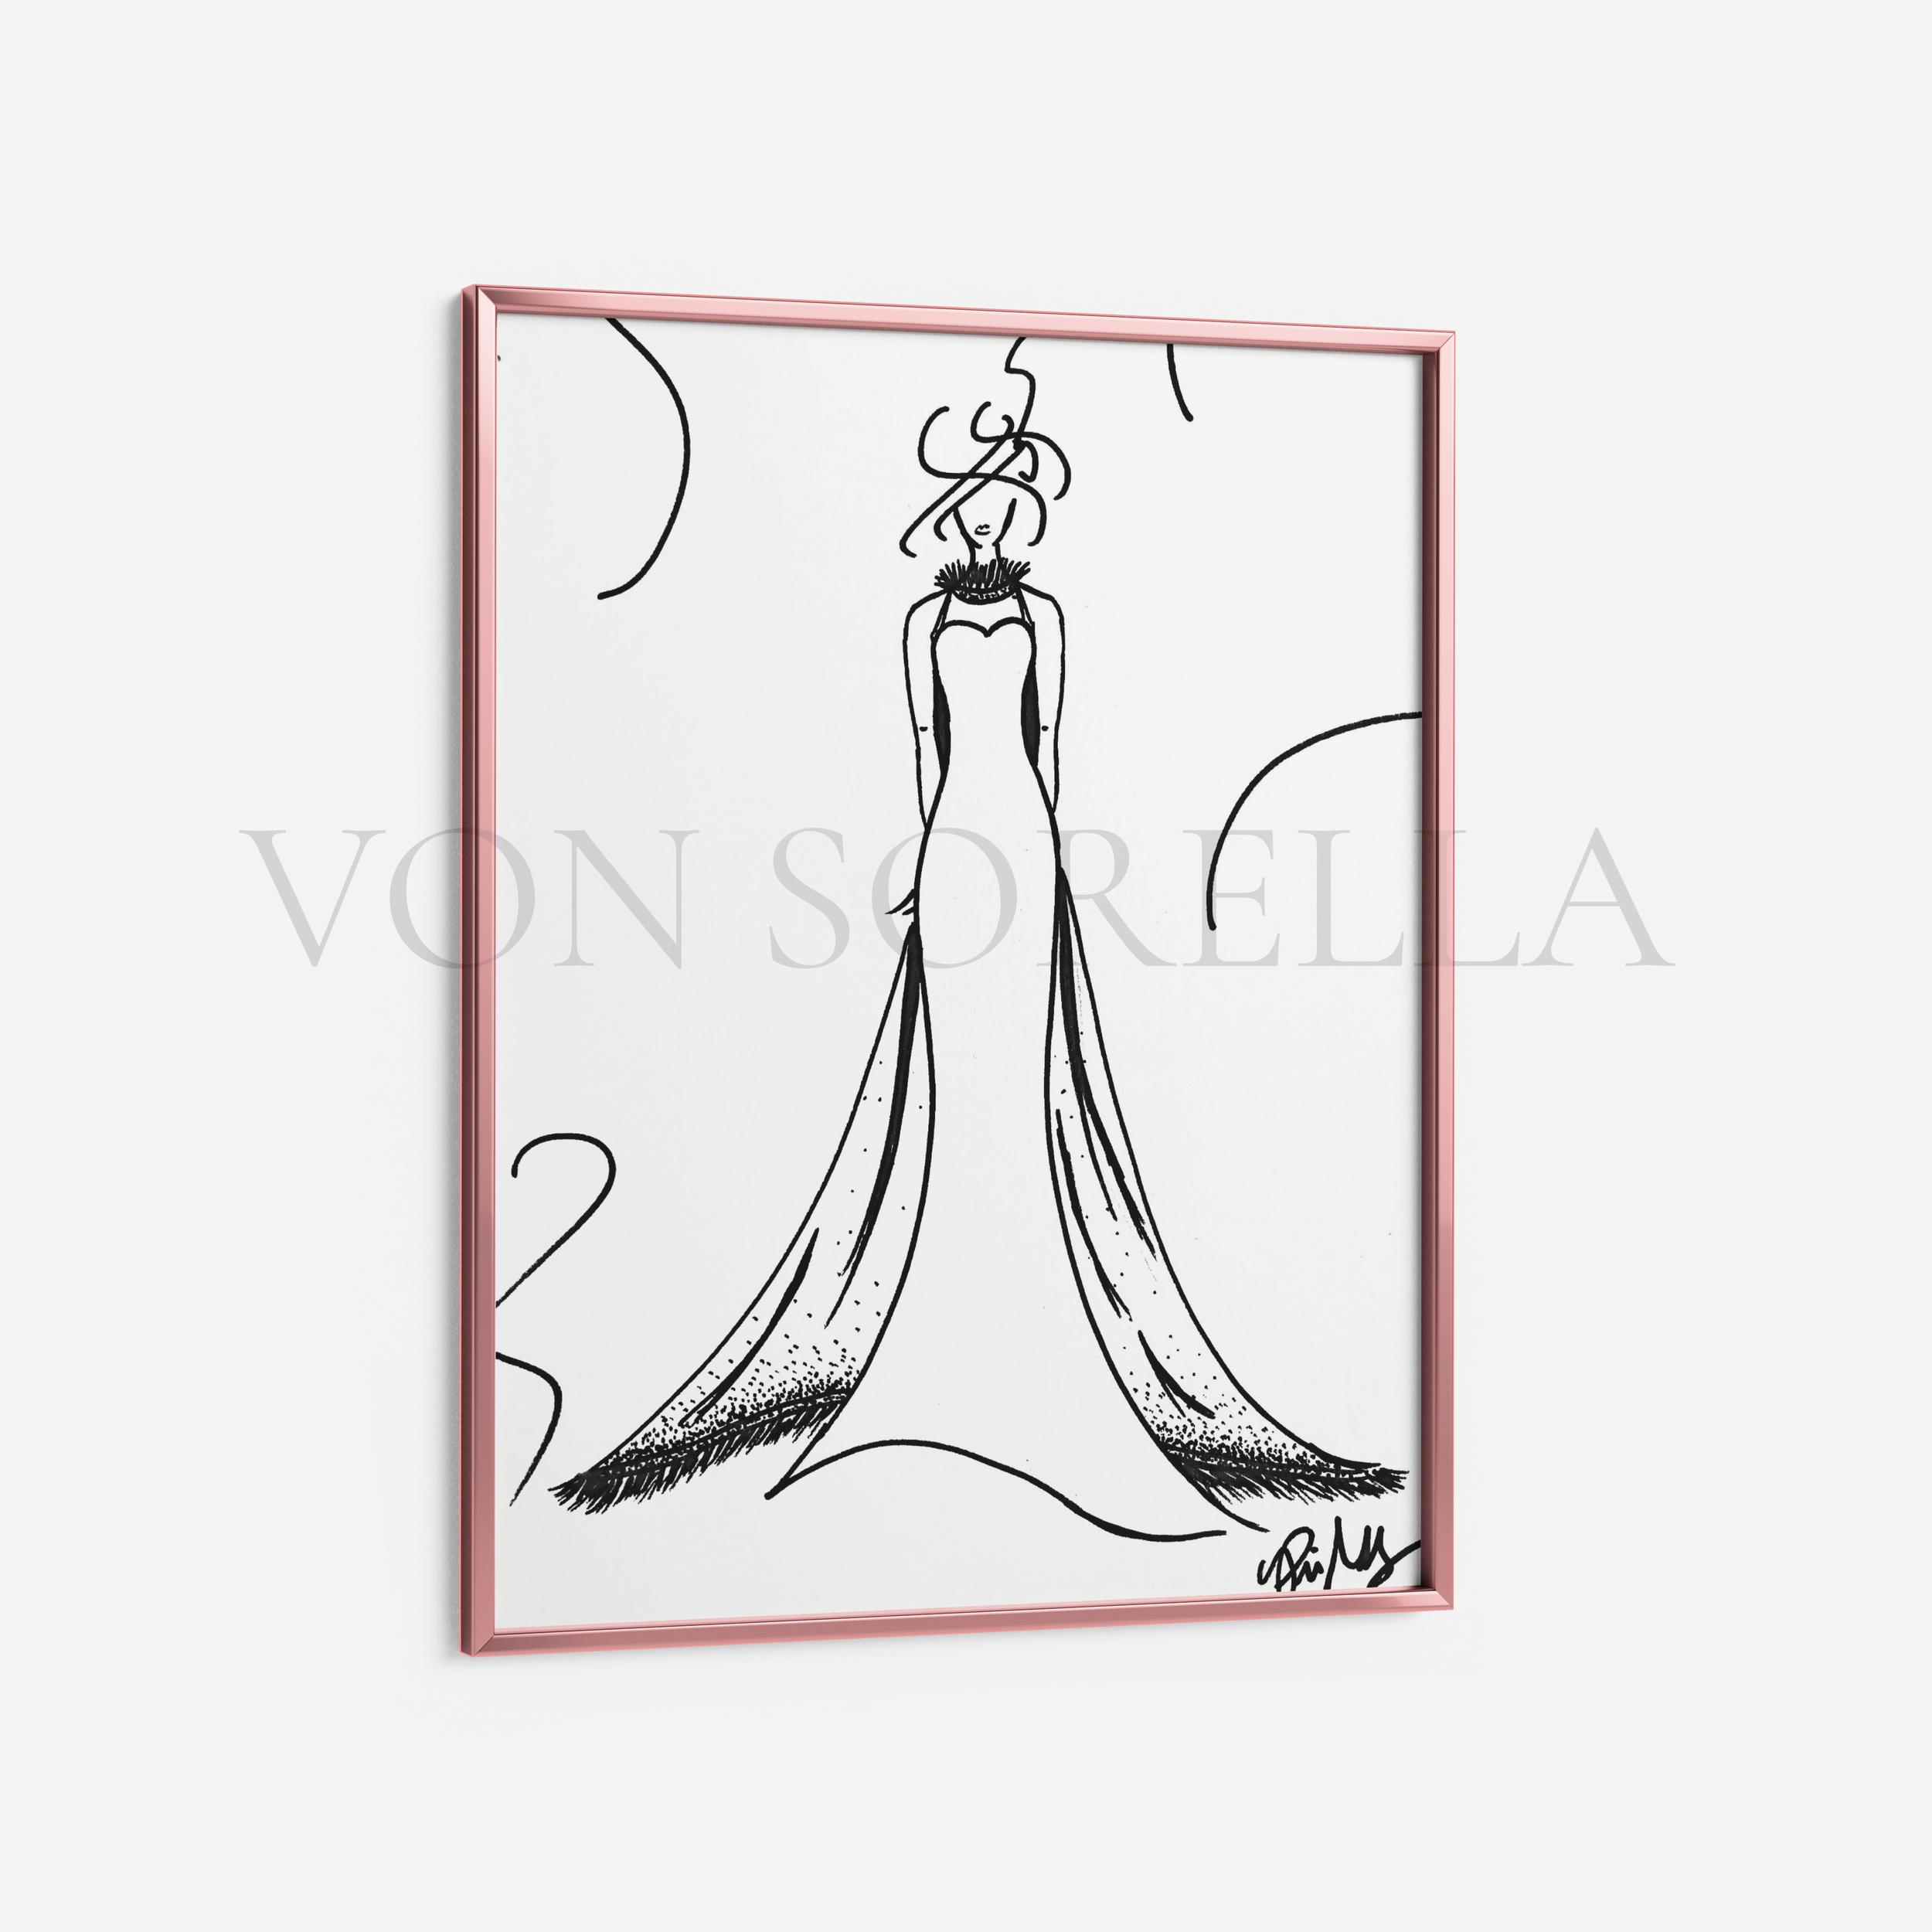 New fashion illustration art prints available now by VON SORELLA. #highfashioneverything